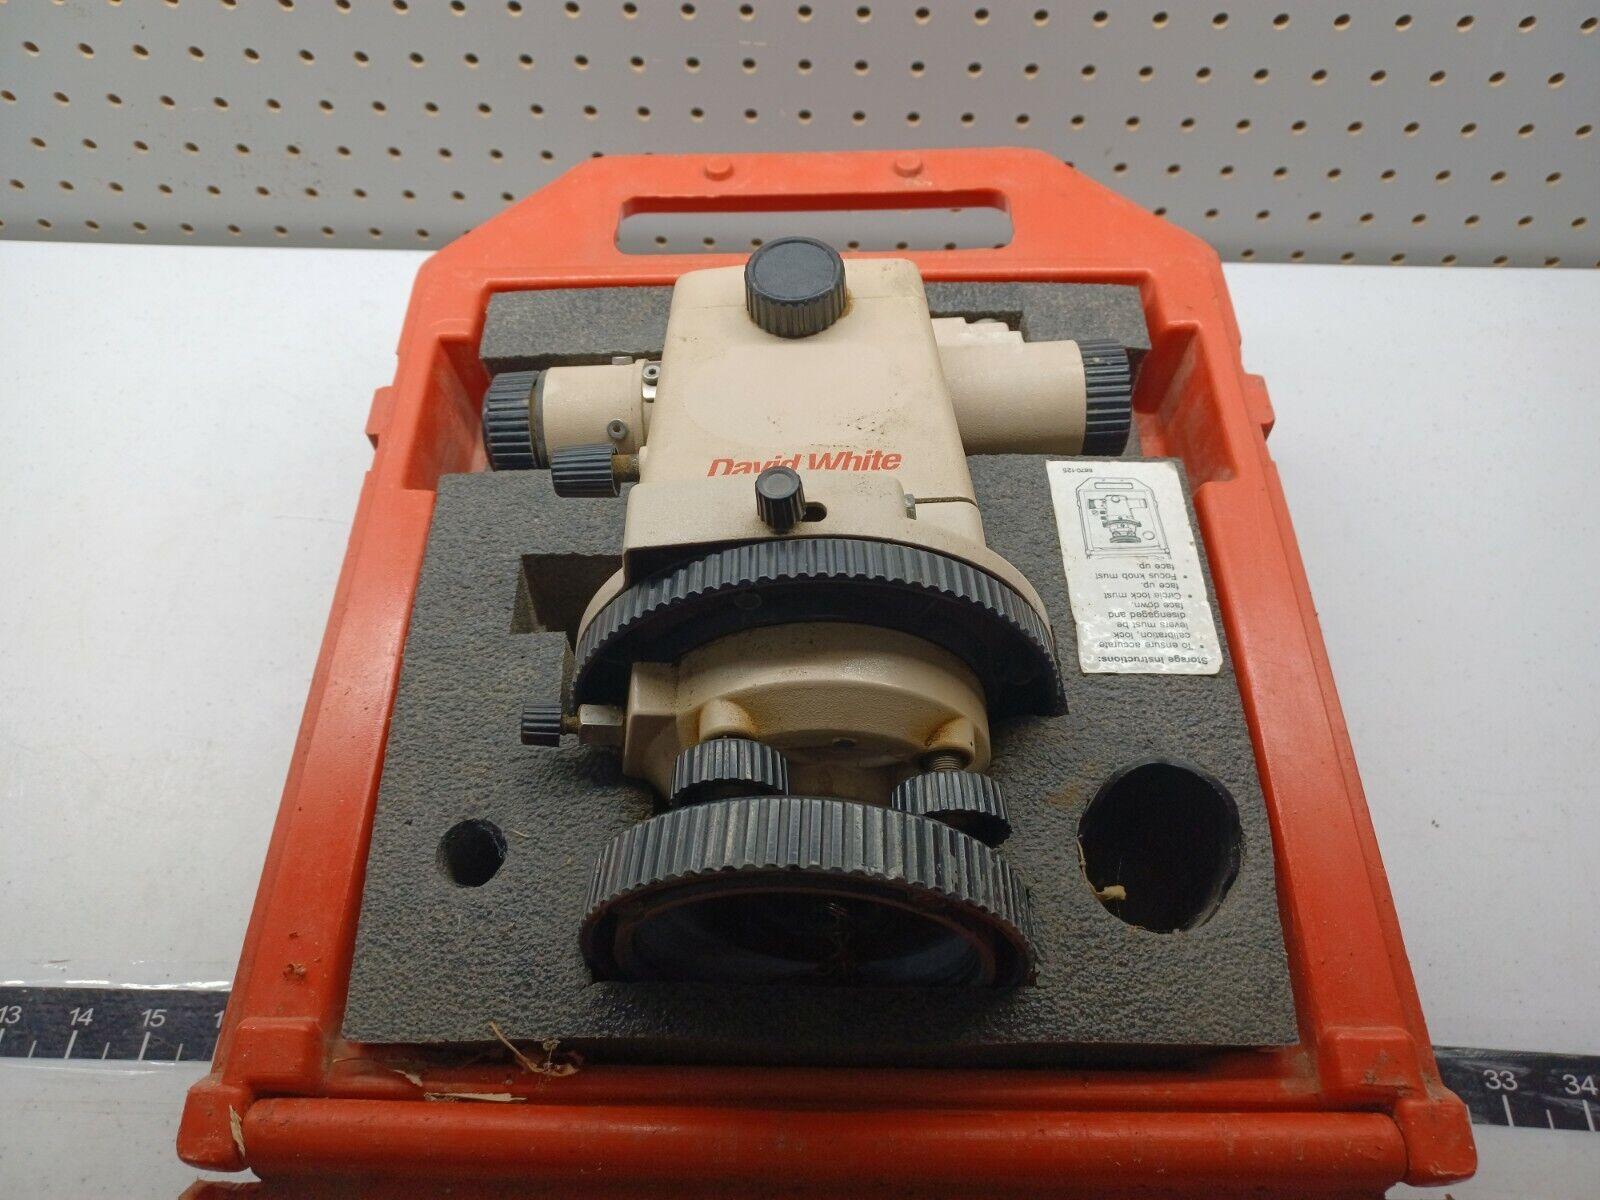 David White LT8-300 Universal Optical Level Transit in Carrying Case, b-x